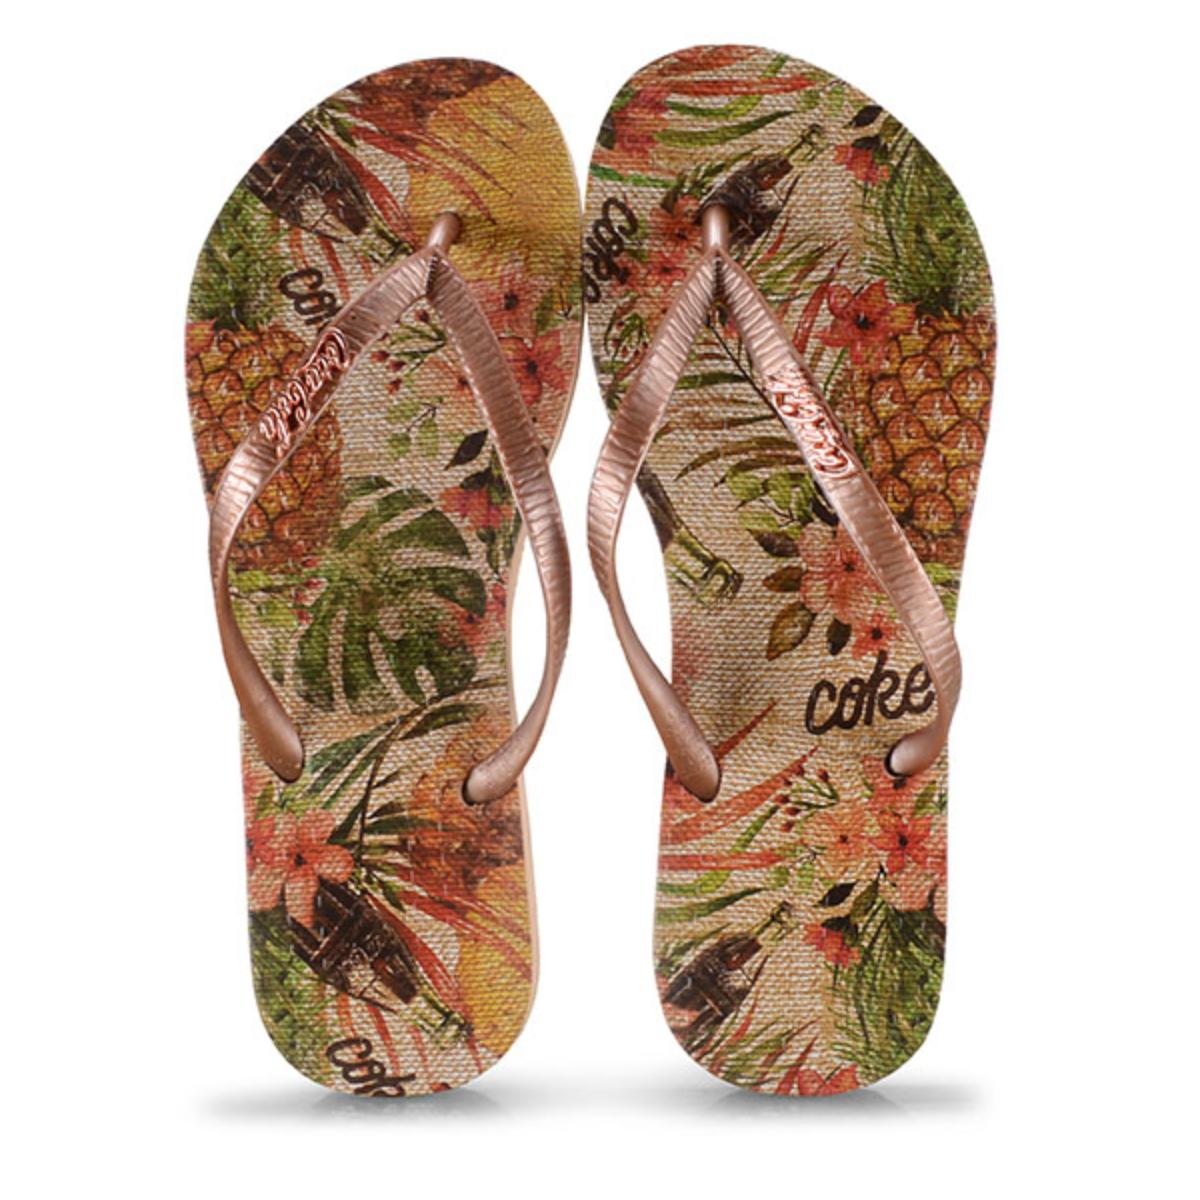 Chinelo Feminino Coca-cola Shoes Cc2742 Bege/cobre